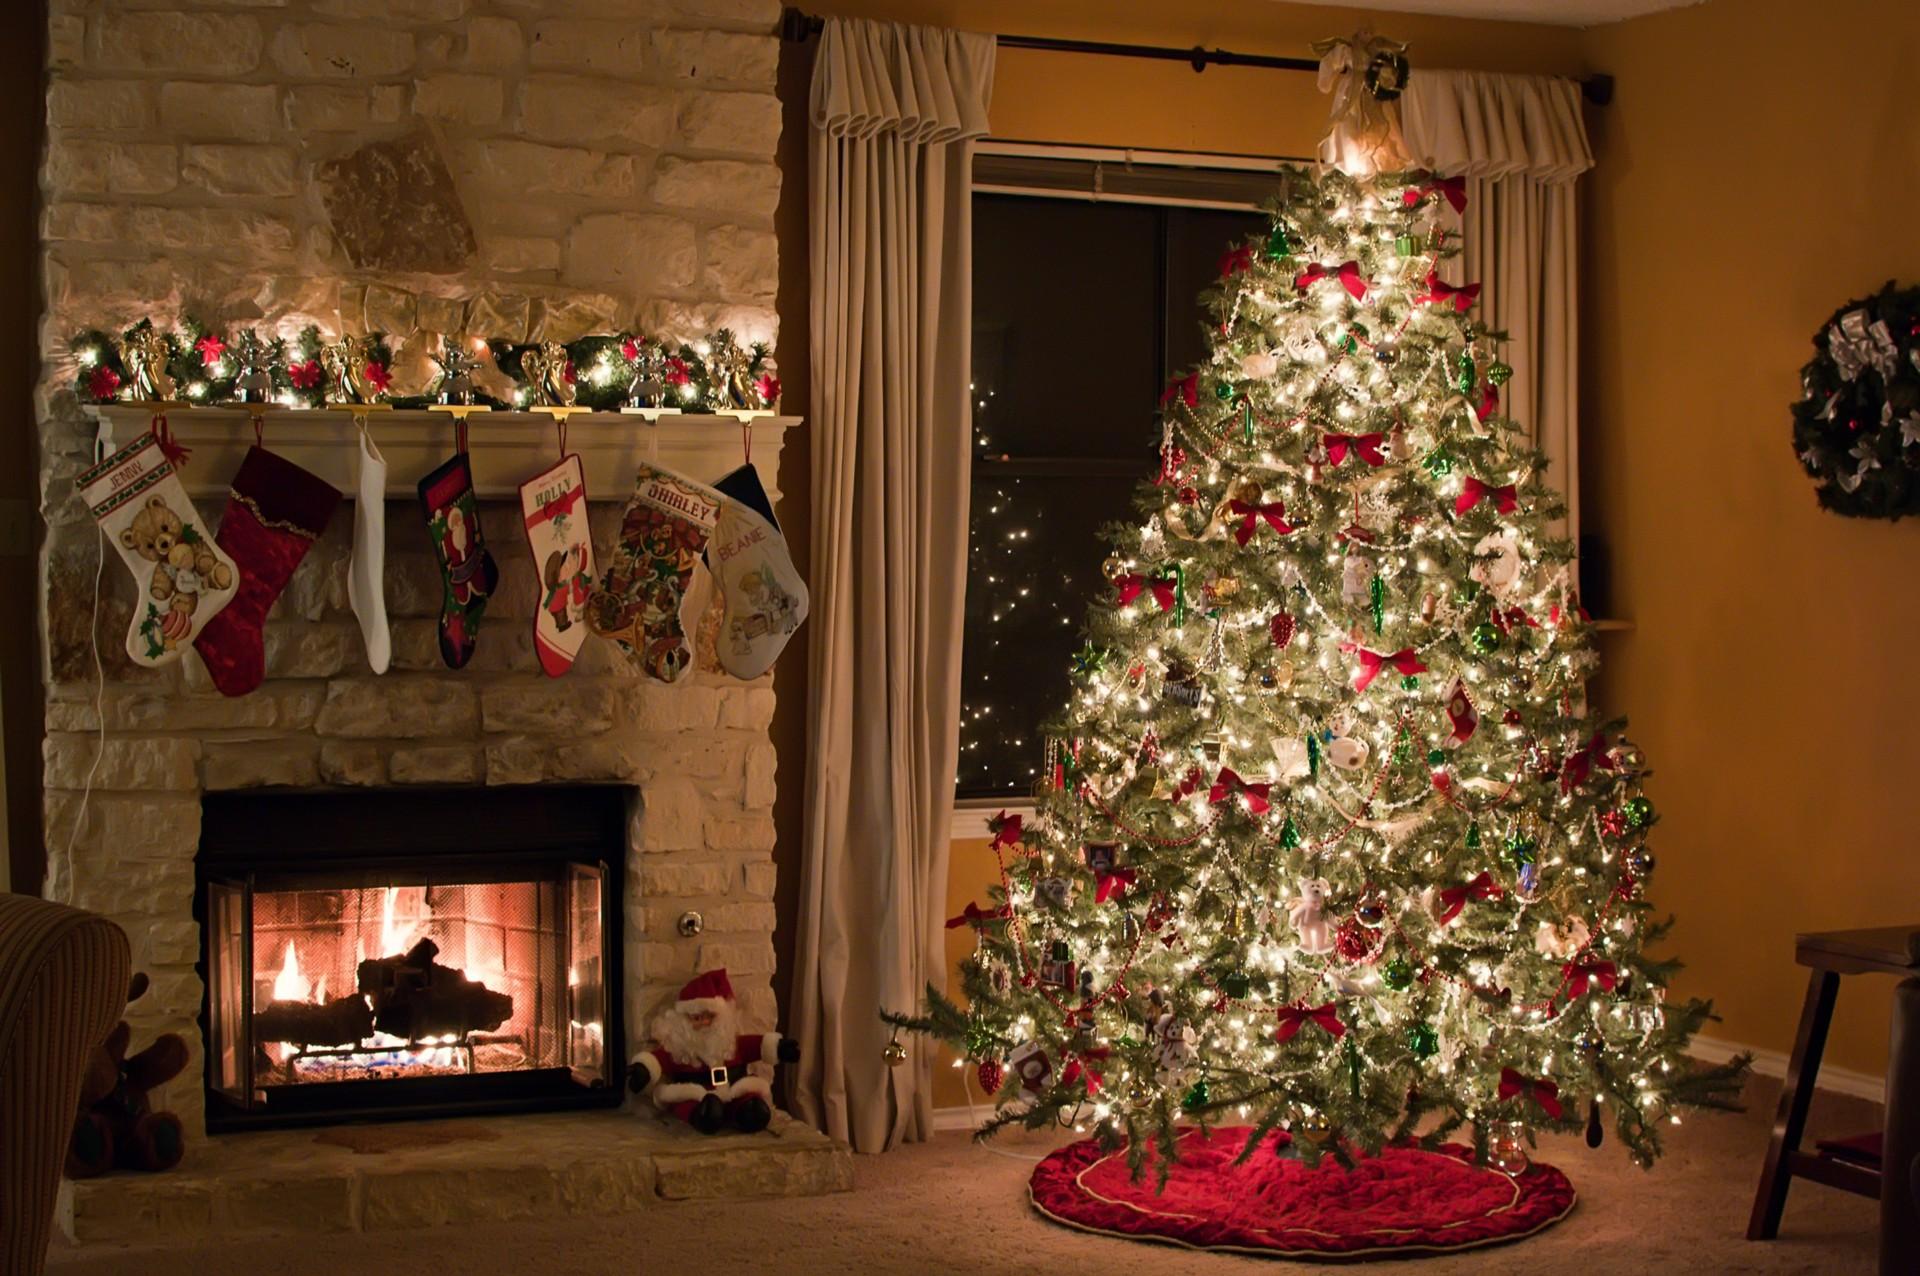 Christmas(December 25th)